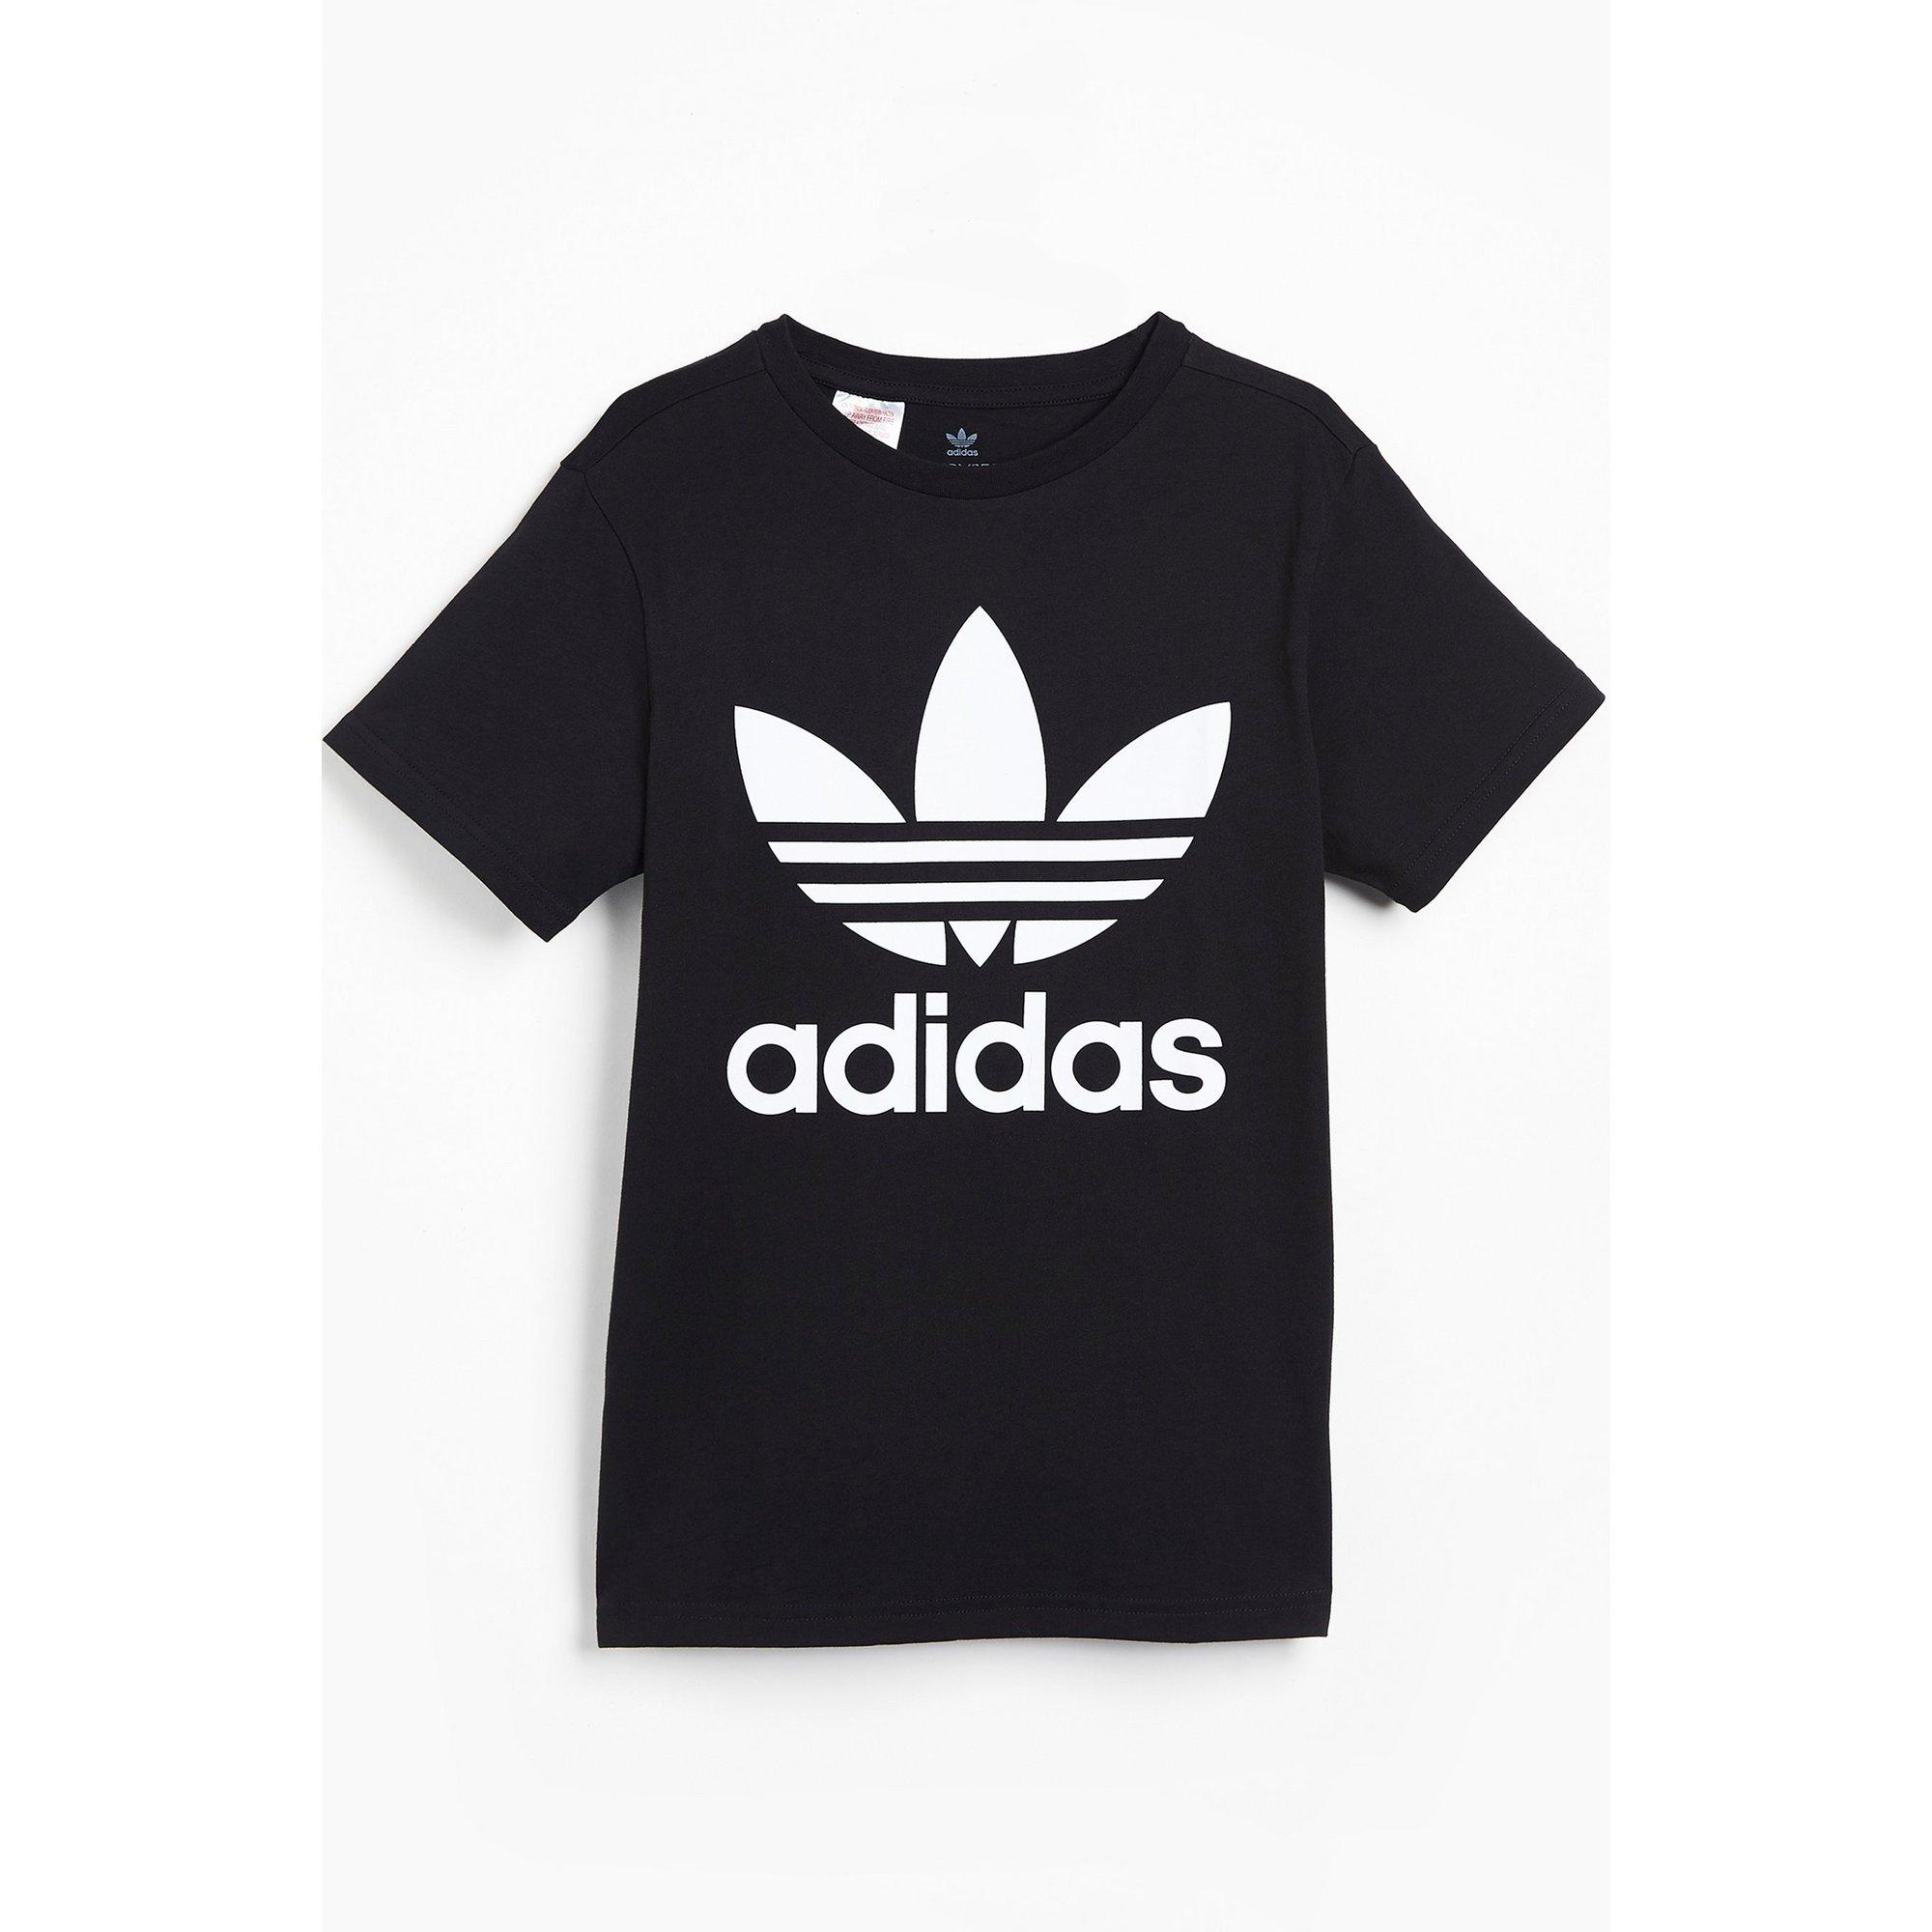 Image of Boys adidas Originals Trefoil Black T-Shirt